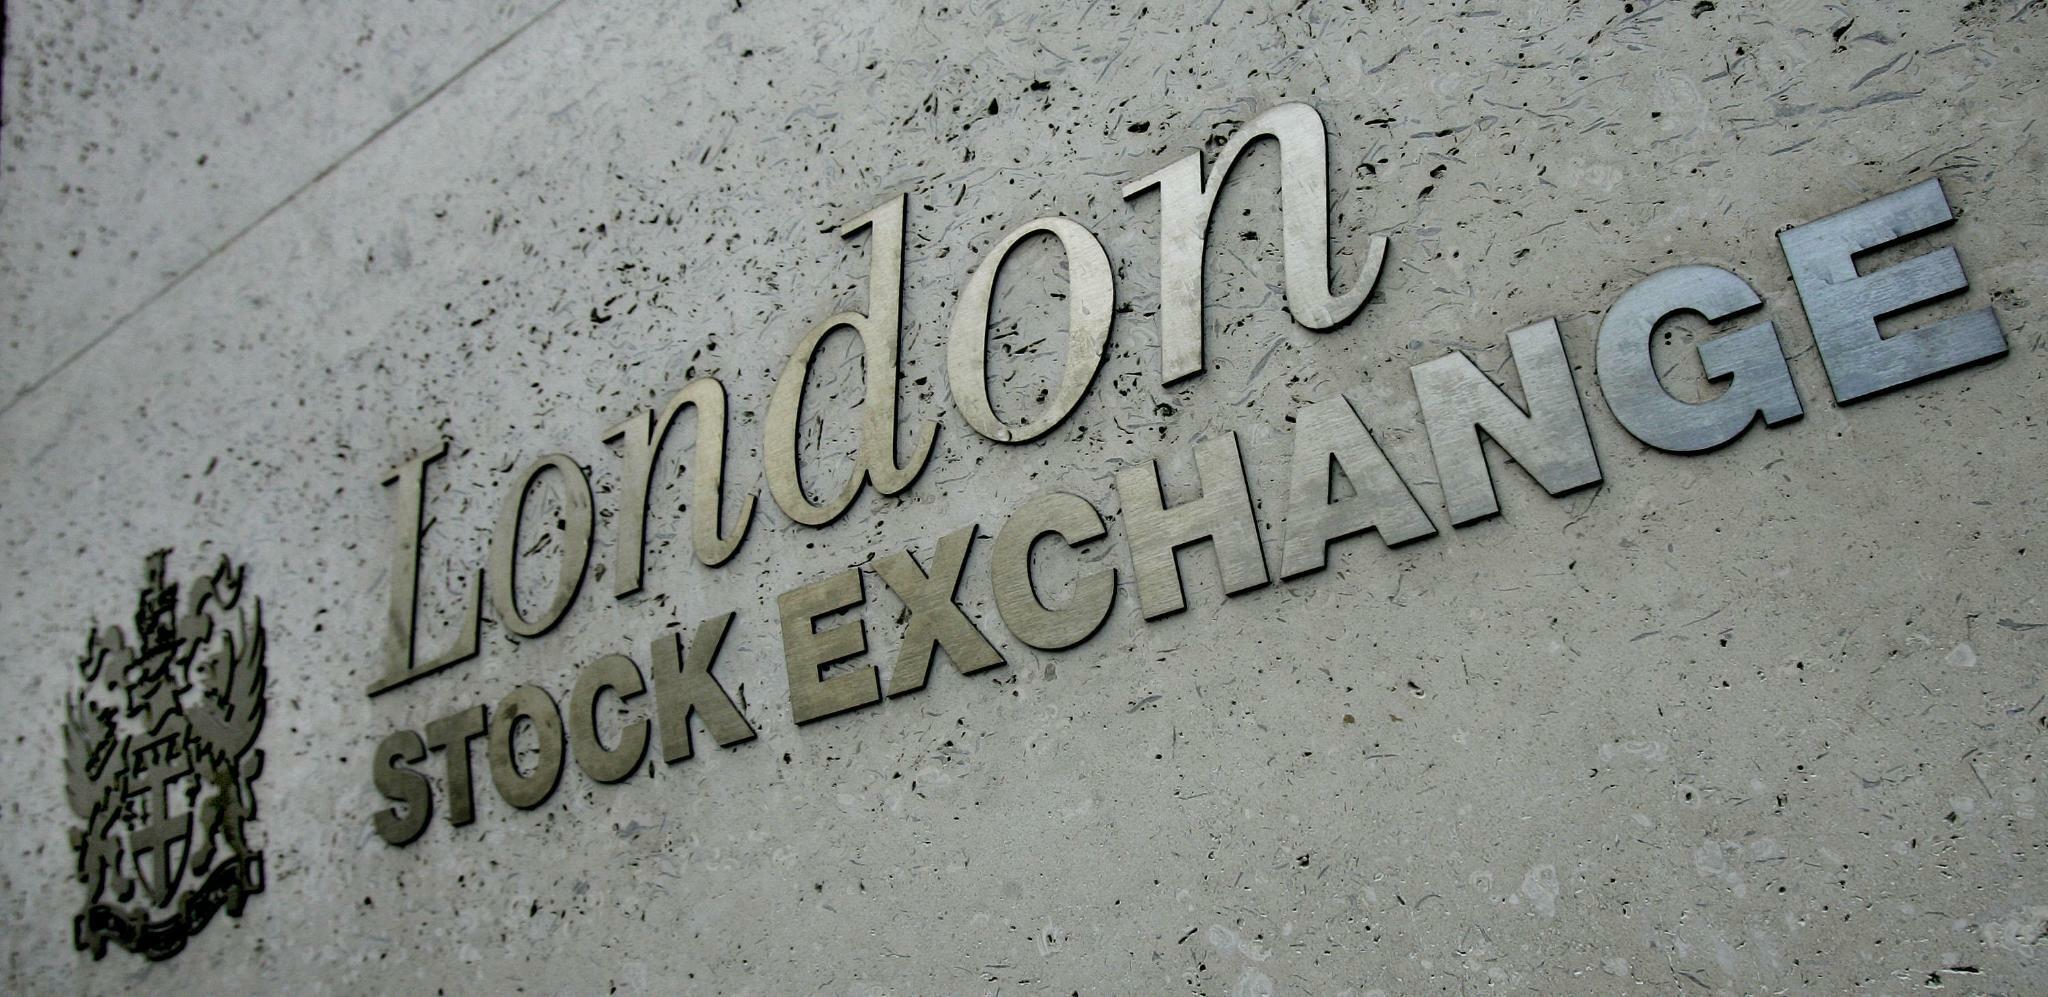 Börse: Londoner Börse LSE profitiert von Marktturbulenzen